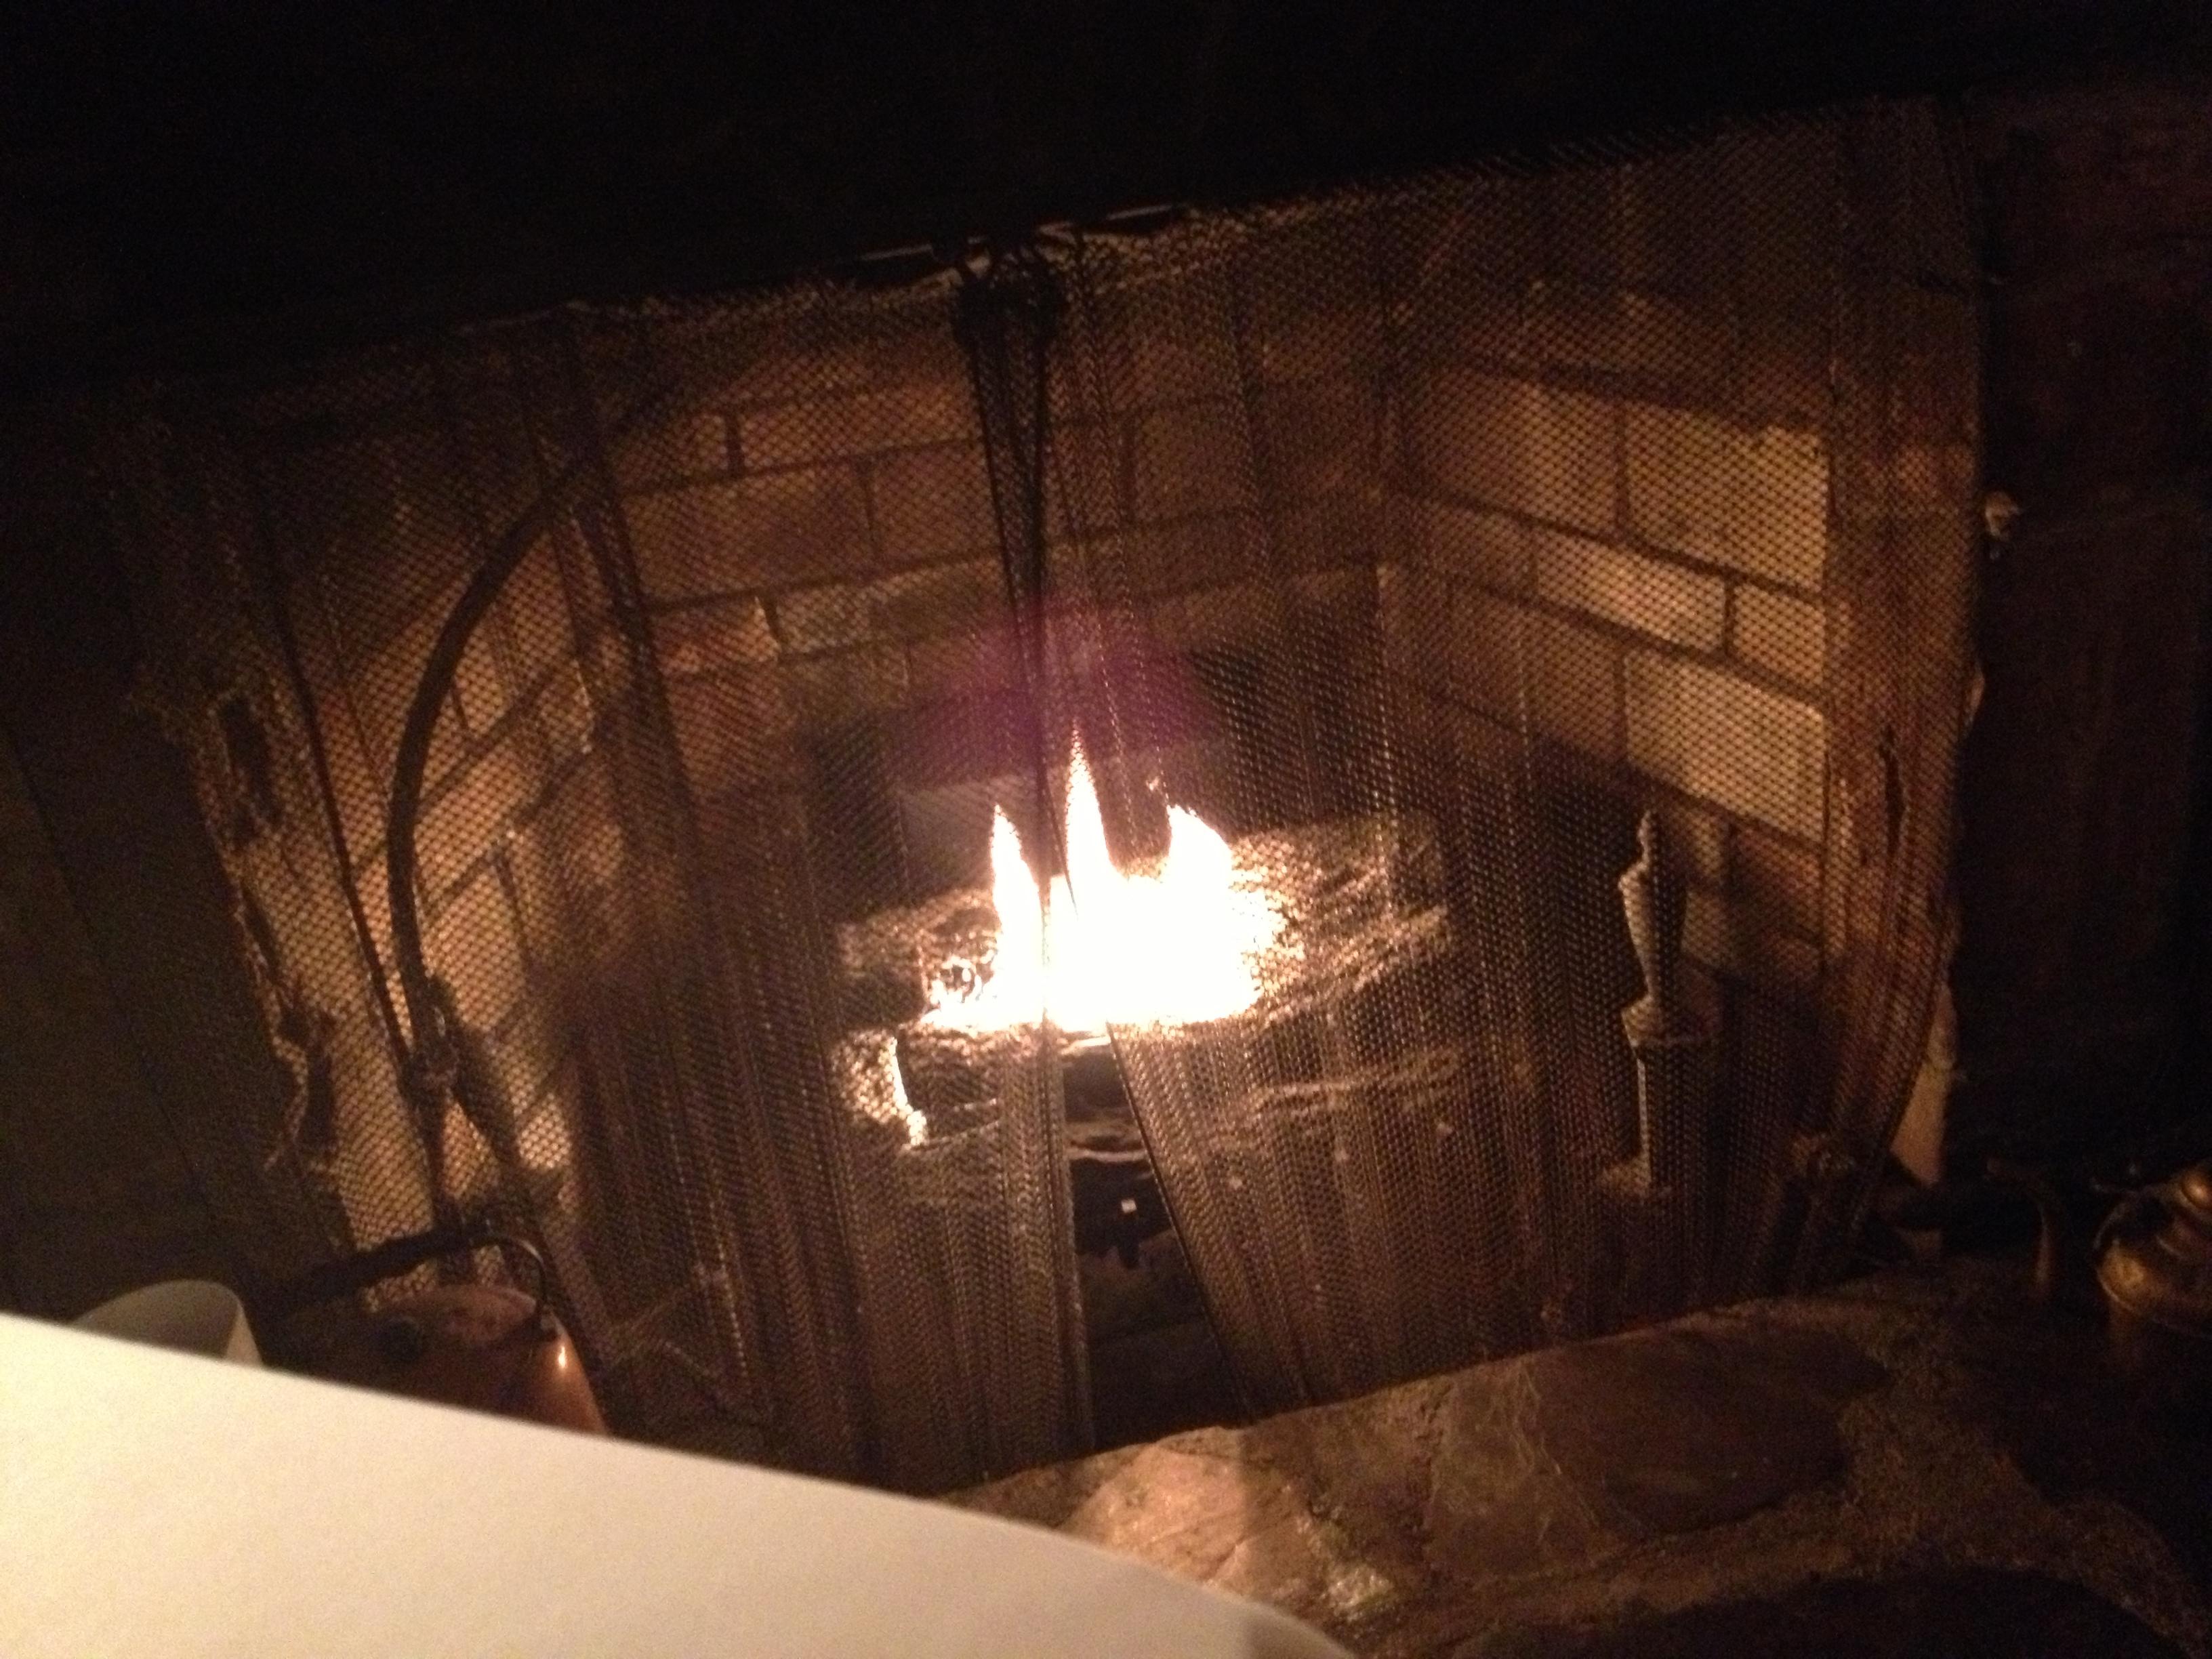 The Wishing Well fireplace